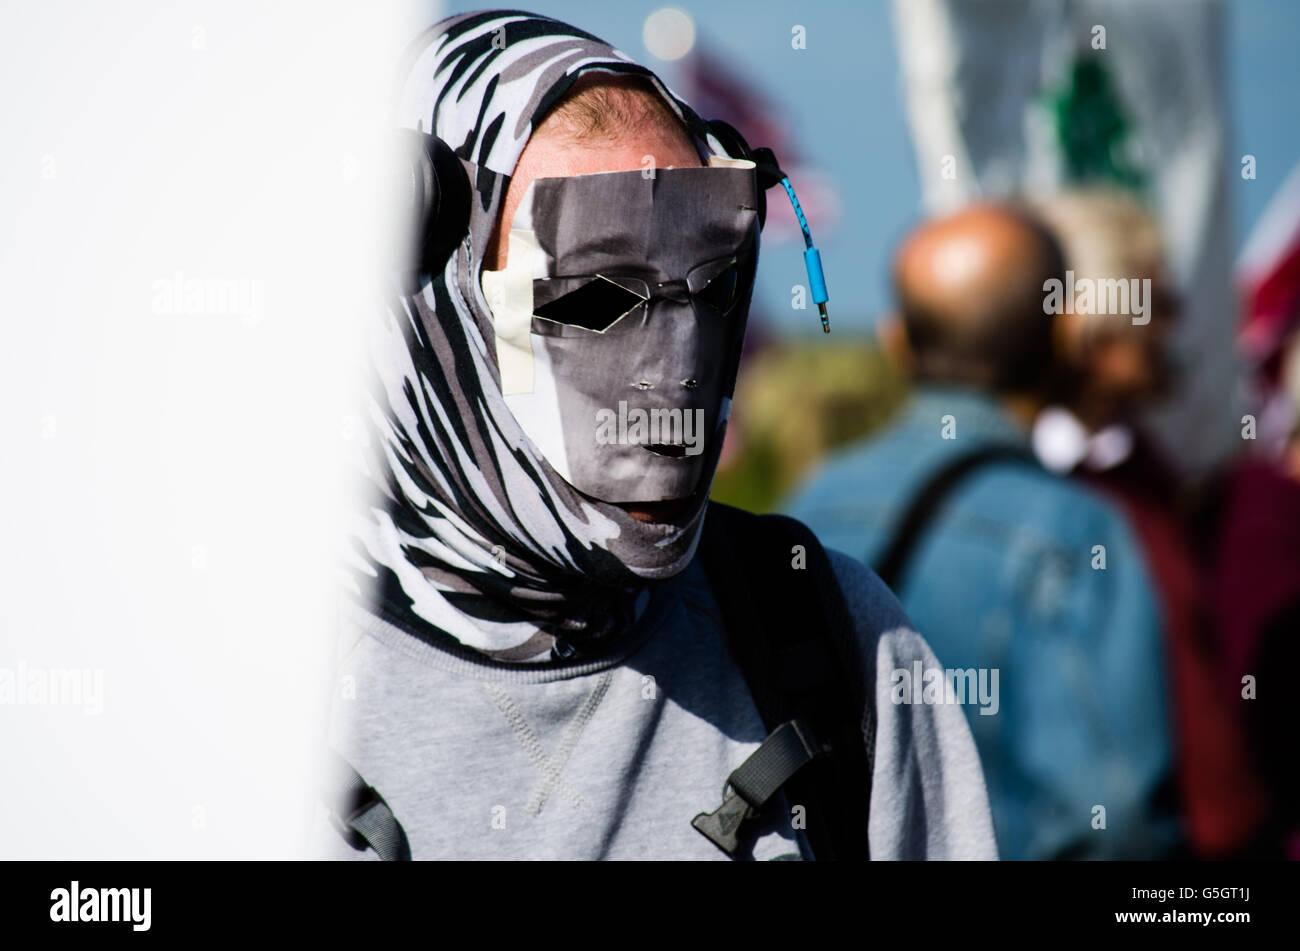 Maskierte Demonstranten mit Edward Snowden Maske Stockbild